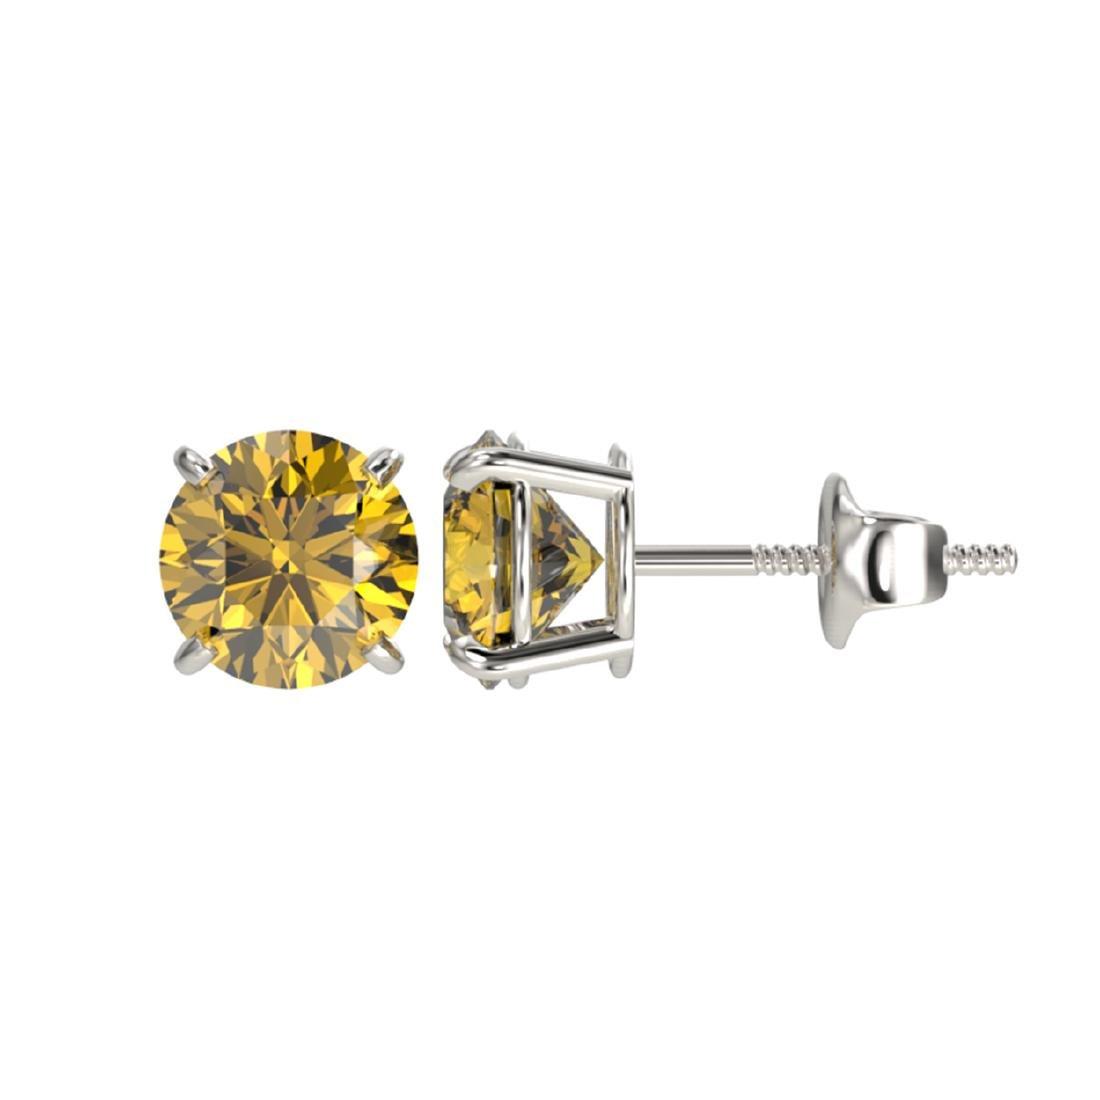 1.50 ctw Intense Yellow Diamond Stud Earrings 10K White - 2